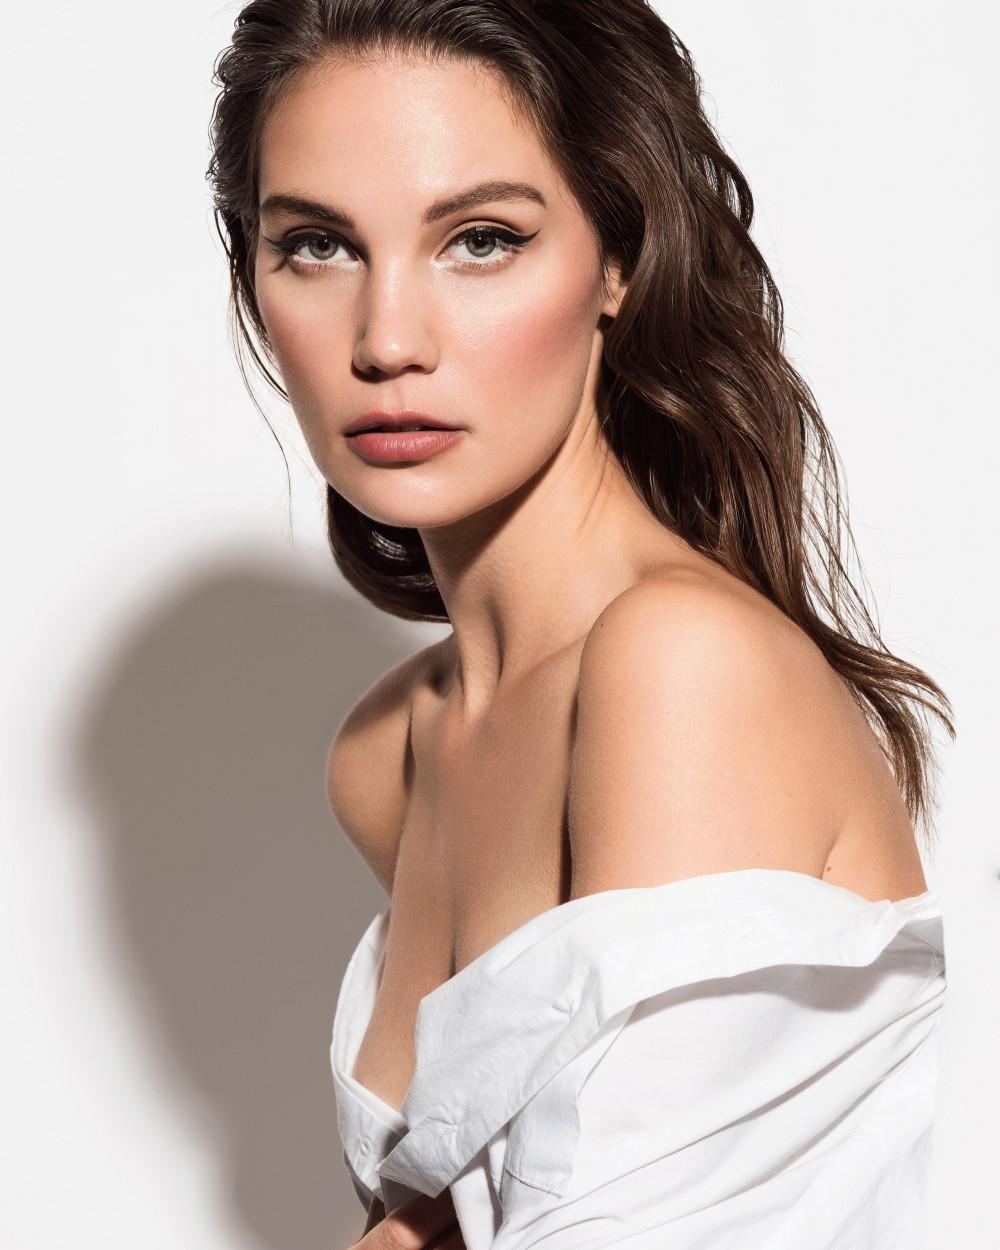 makeup by Bridal by Stefania www.bridalbystefania.co.uk - Make Me Bridal Artist: BridalbyStefania. Photography by: Jeff Tuliniemi. #naturalmakeup #eyeliner #editorial